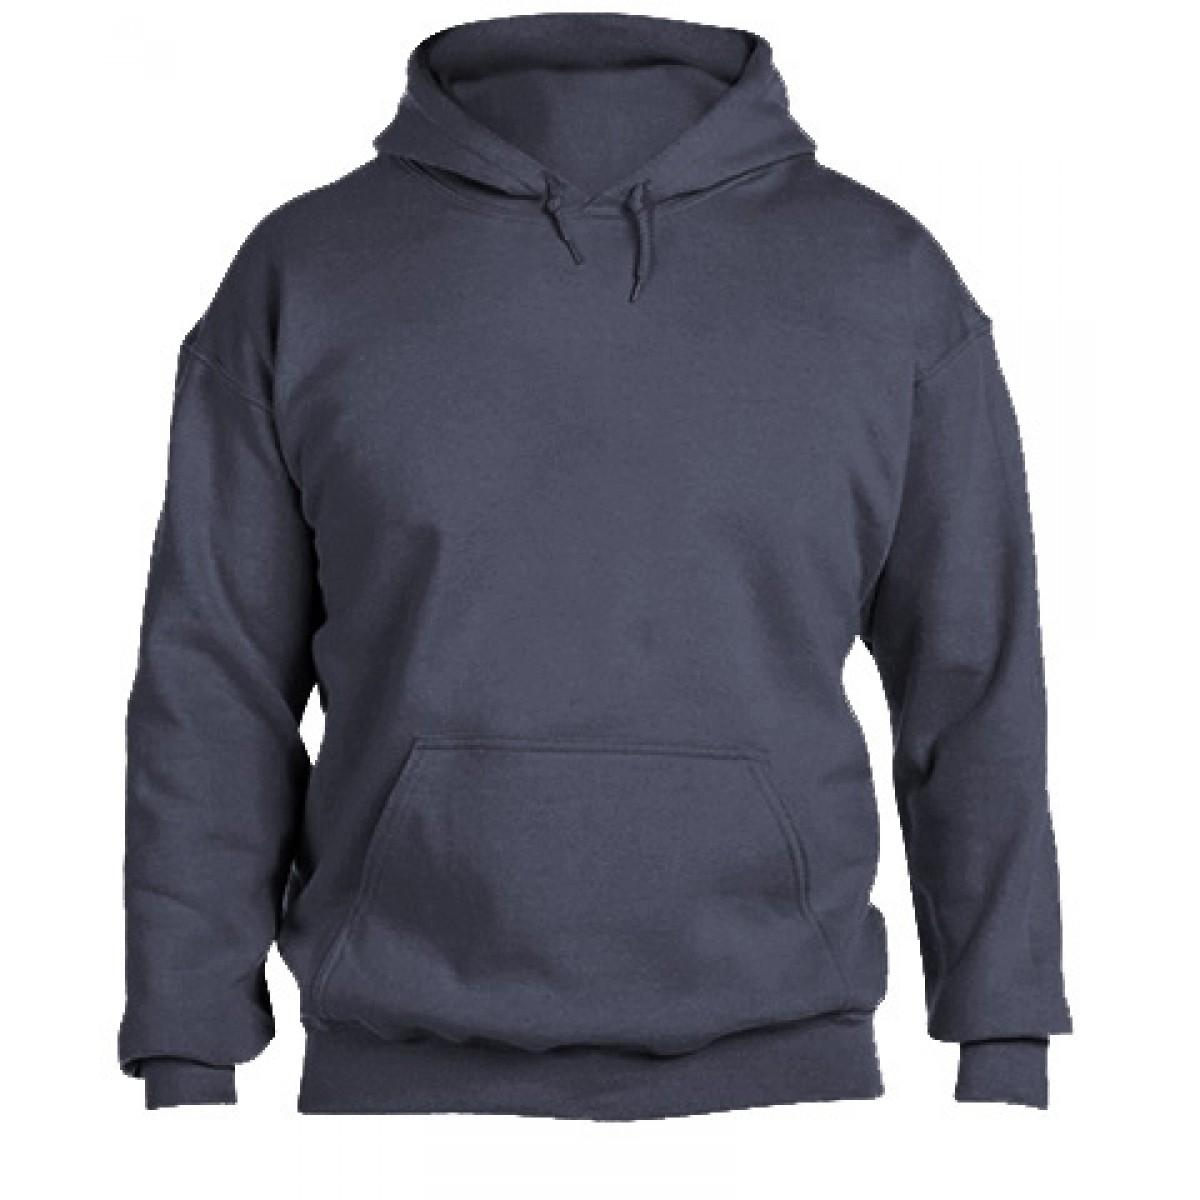 Solid Hooded Sweatshirt  50/50 Heavy Blend-Heather Navy-YL